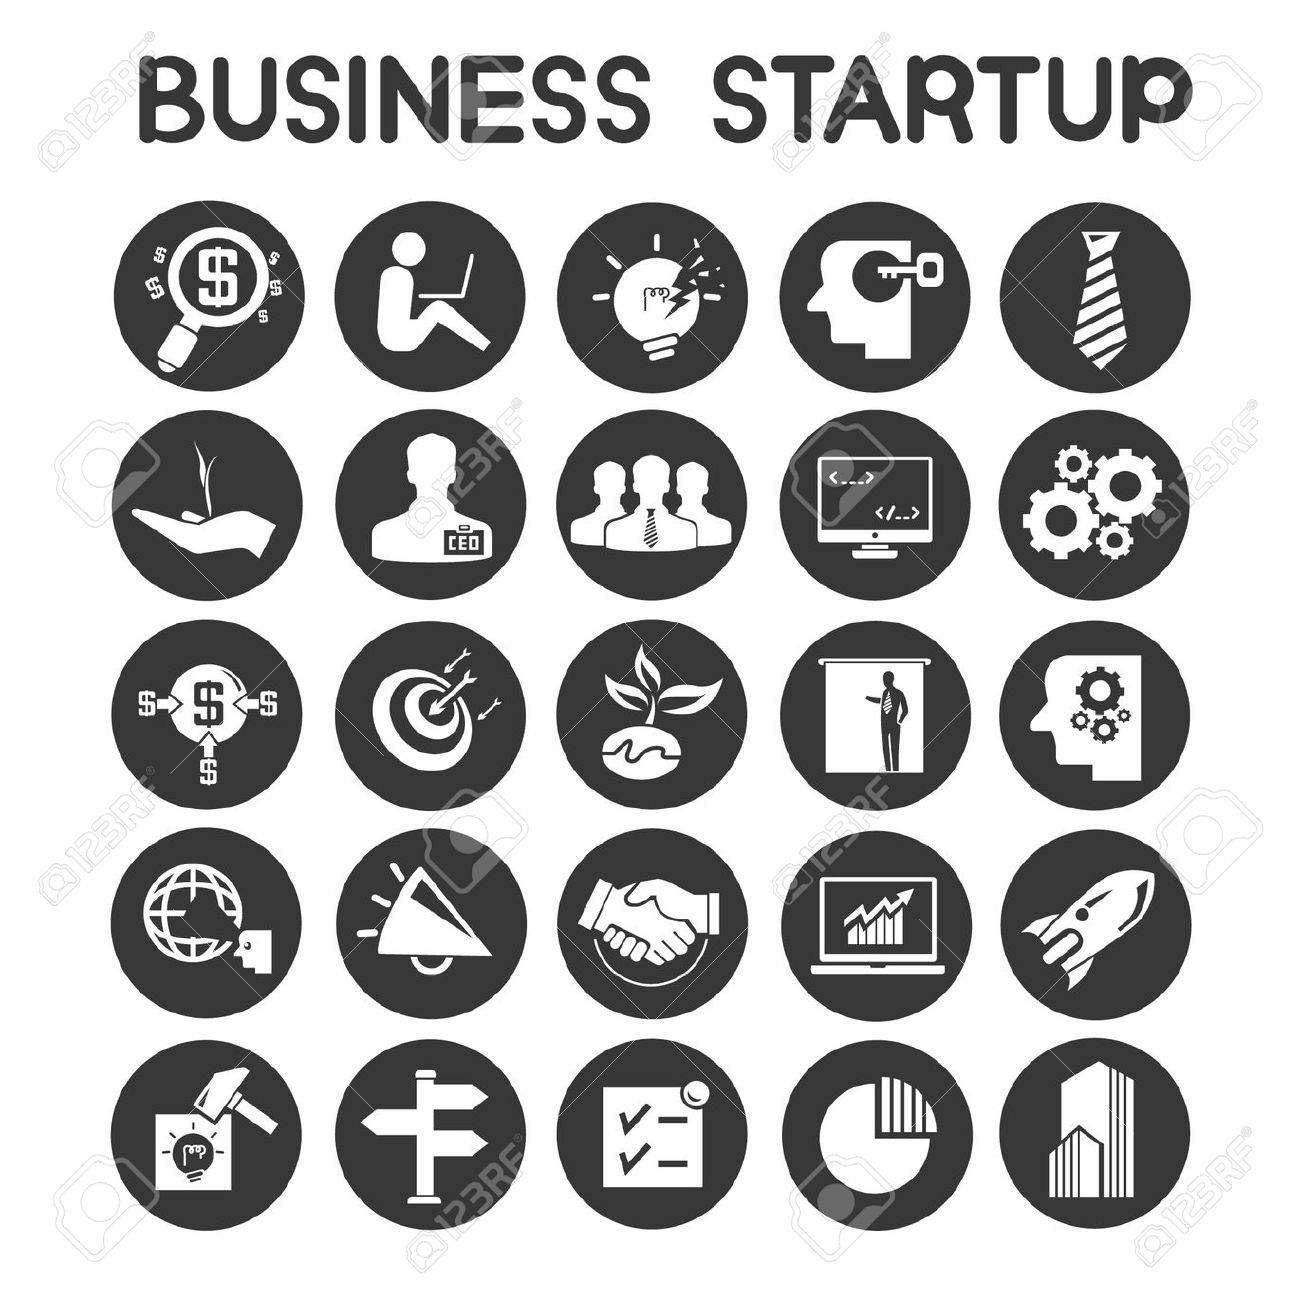 Educomshala - Best Startup Marketing Training Institute in